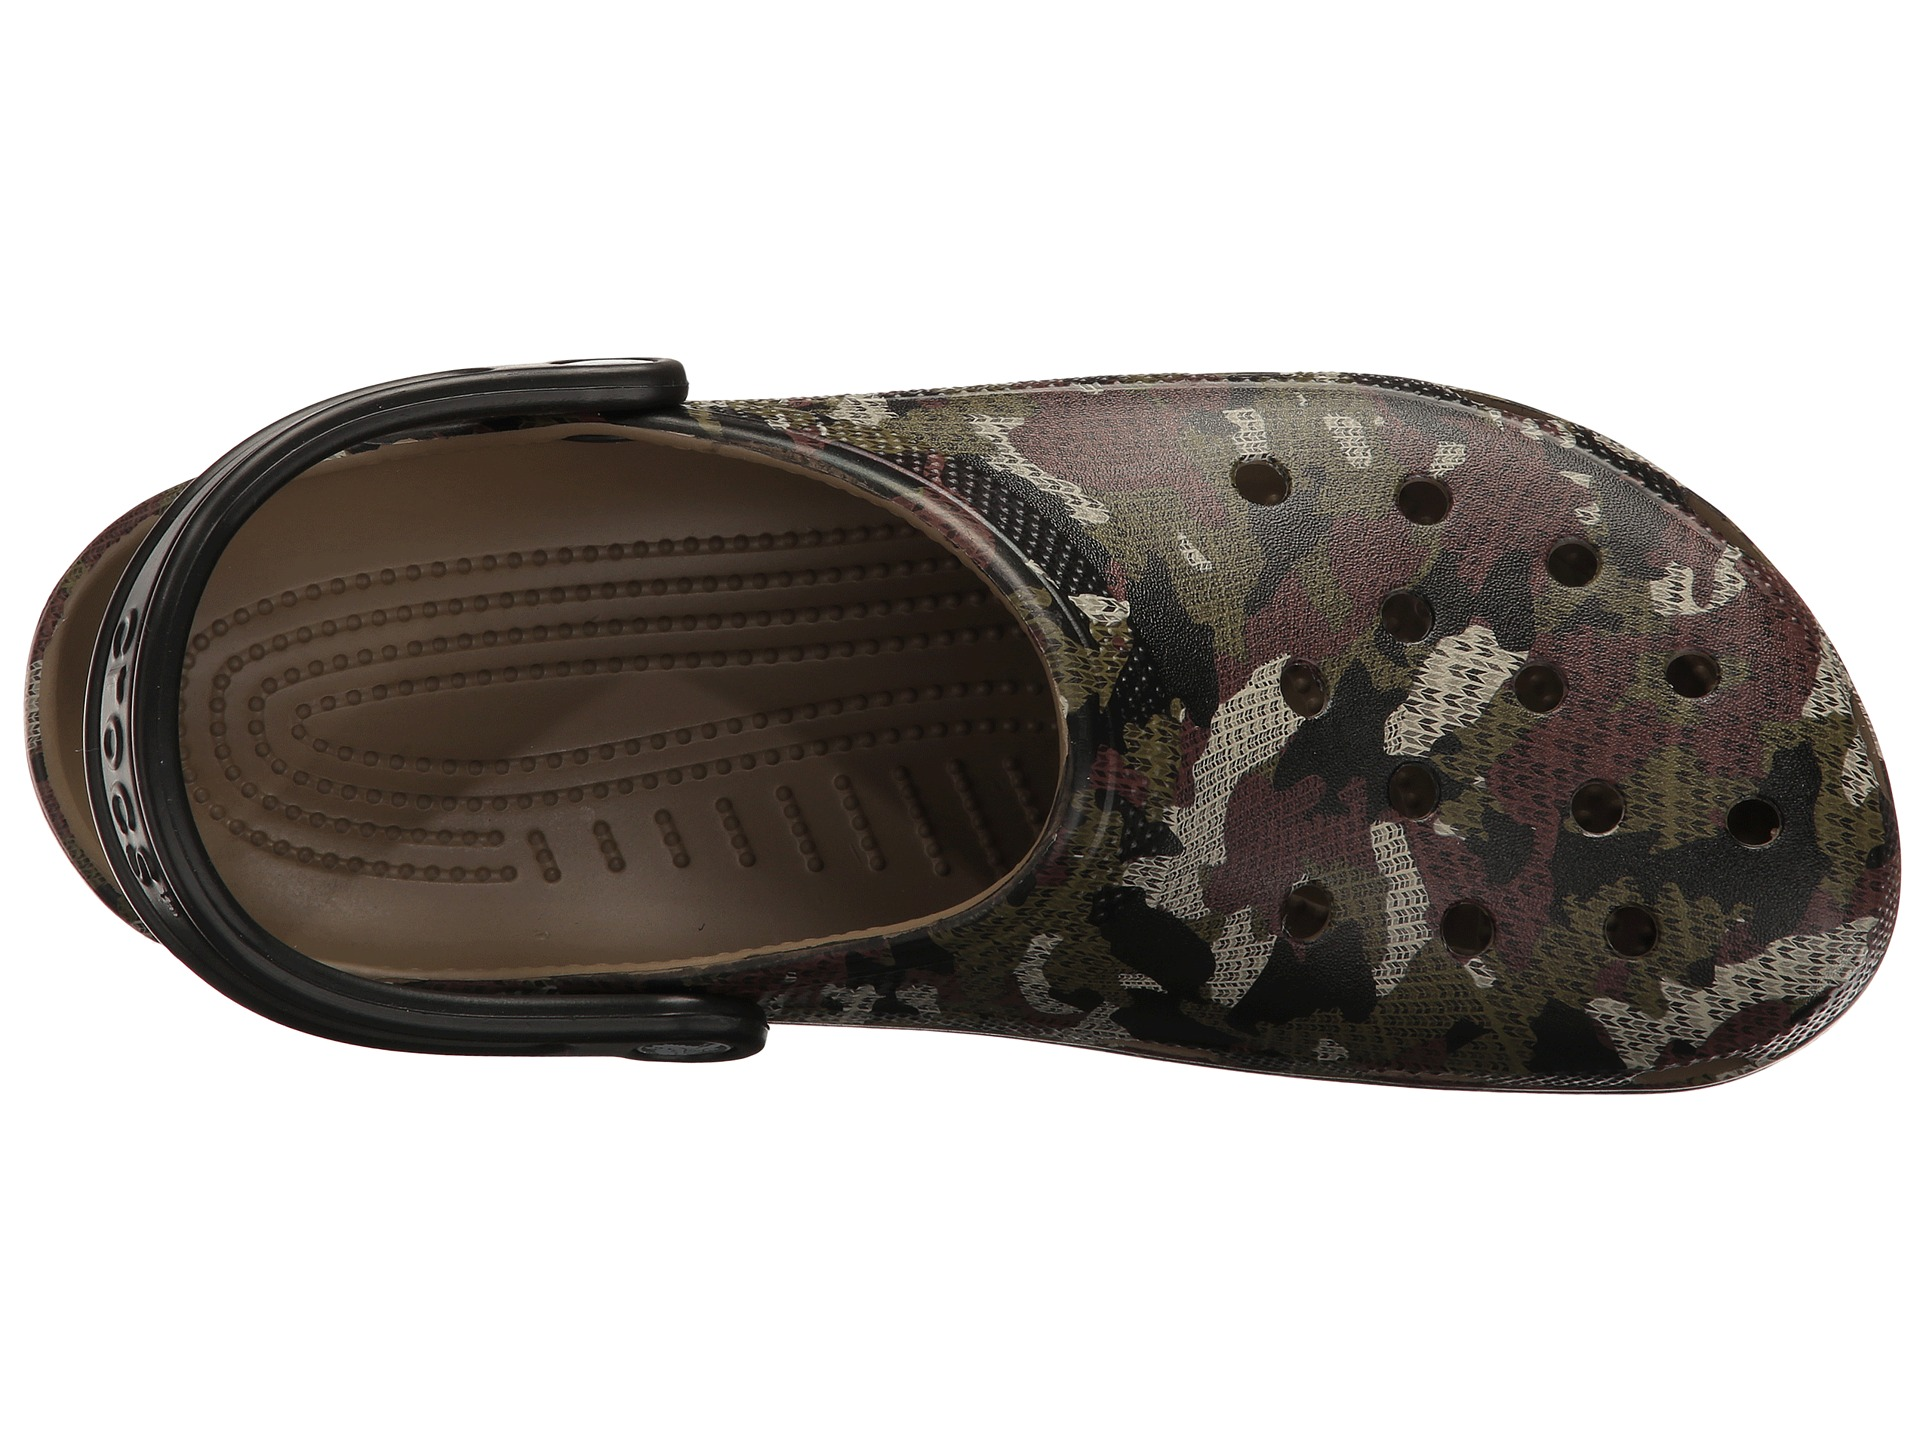 Crocs Classic Camo Clog at Zapposcom